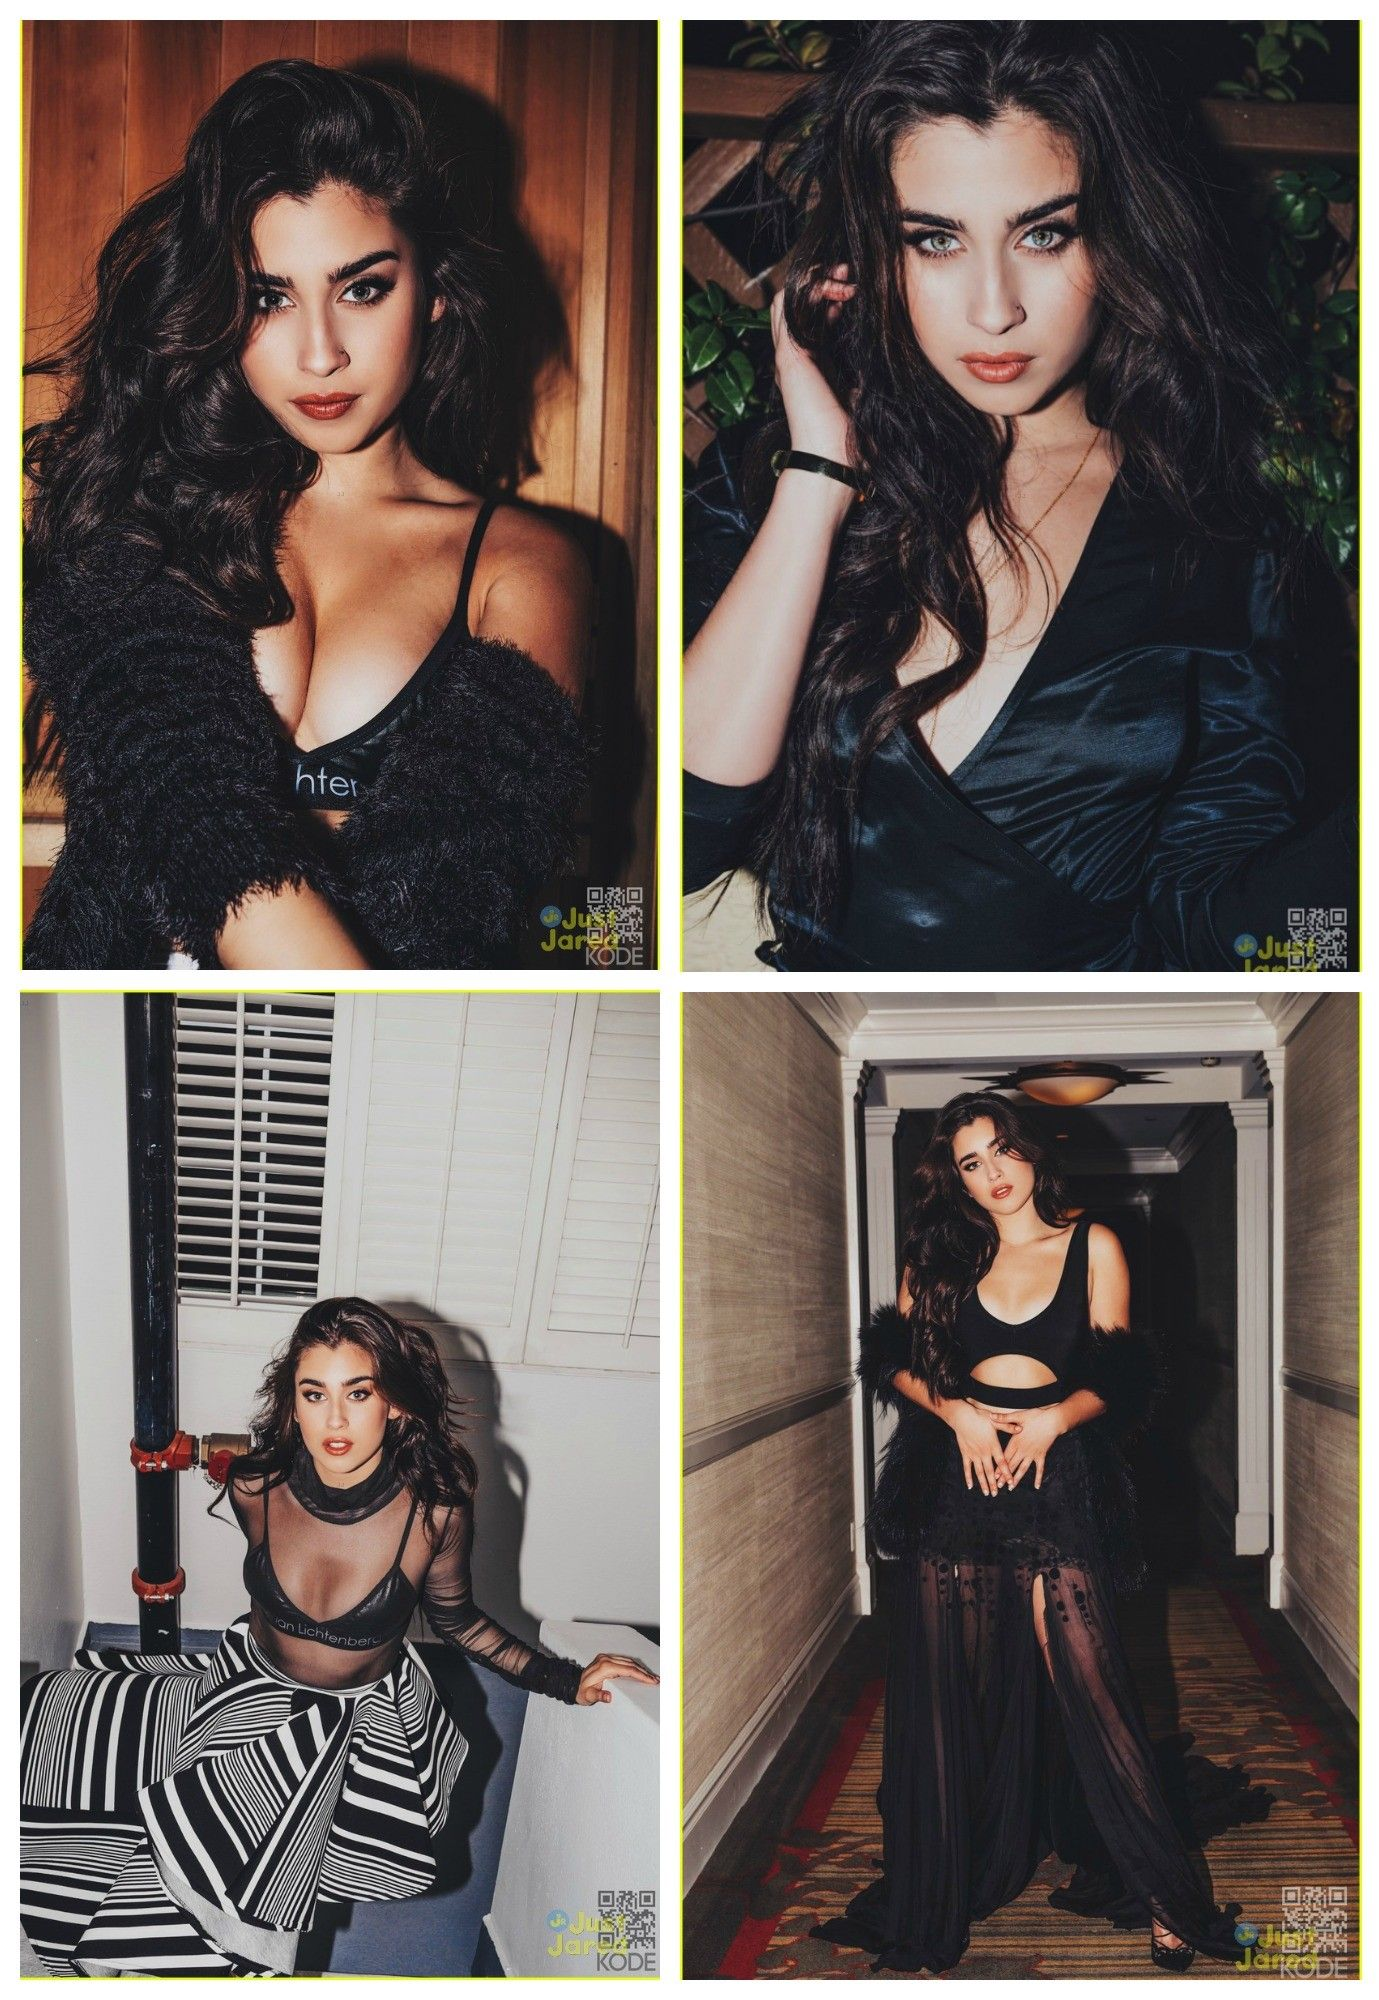 Lauren Jauregui's Photoshoot For Kode Magazine...I CANNOT